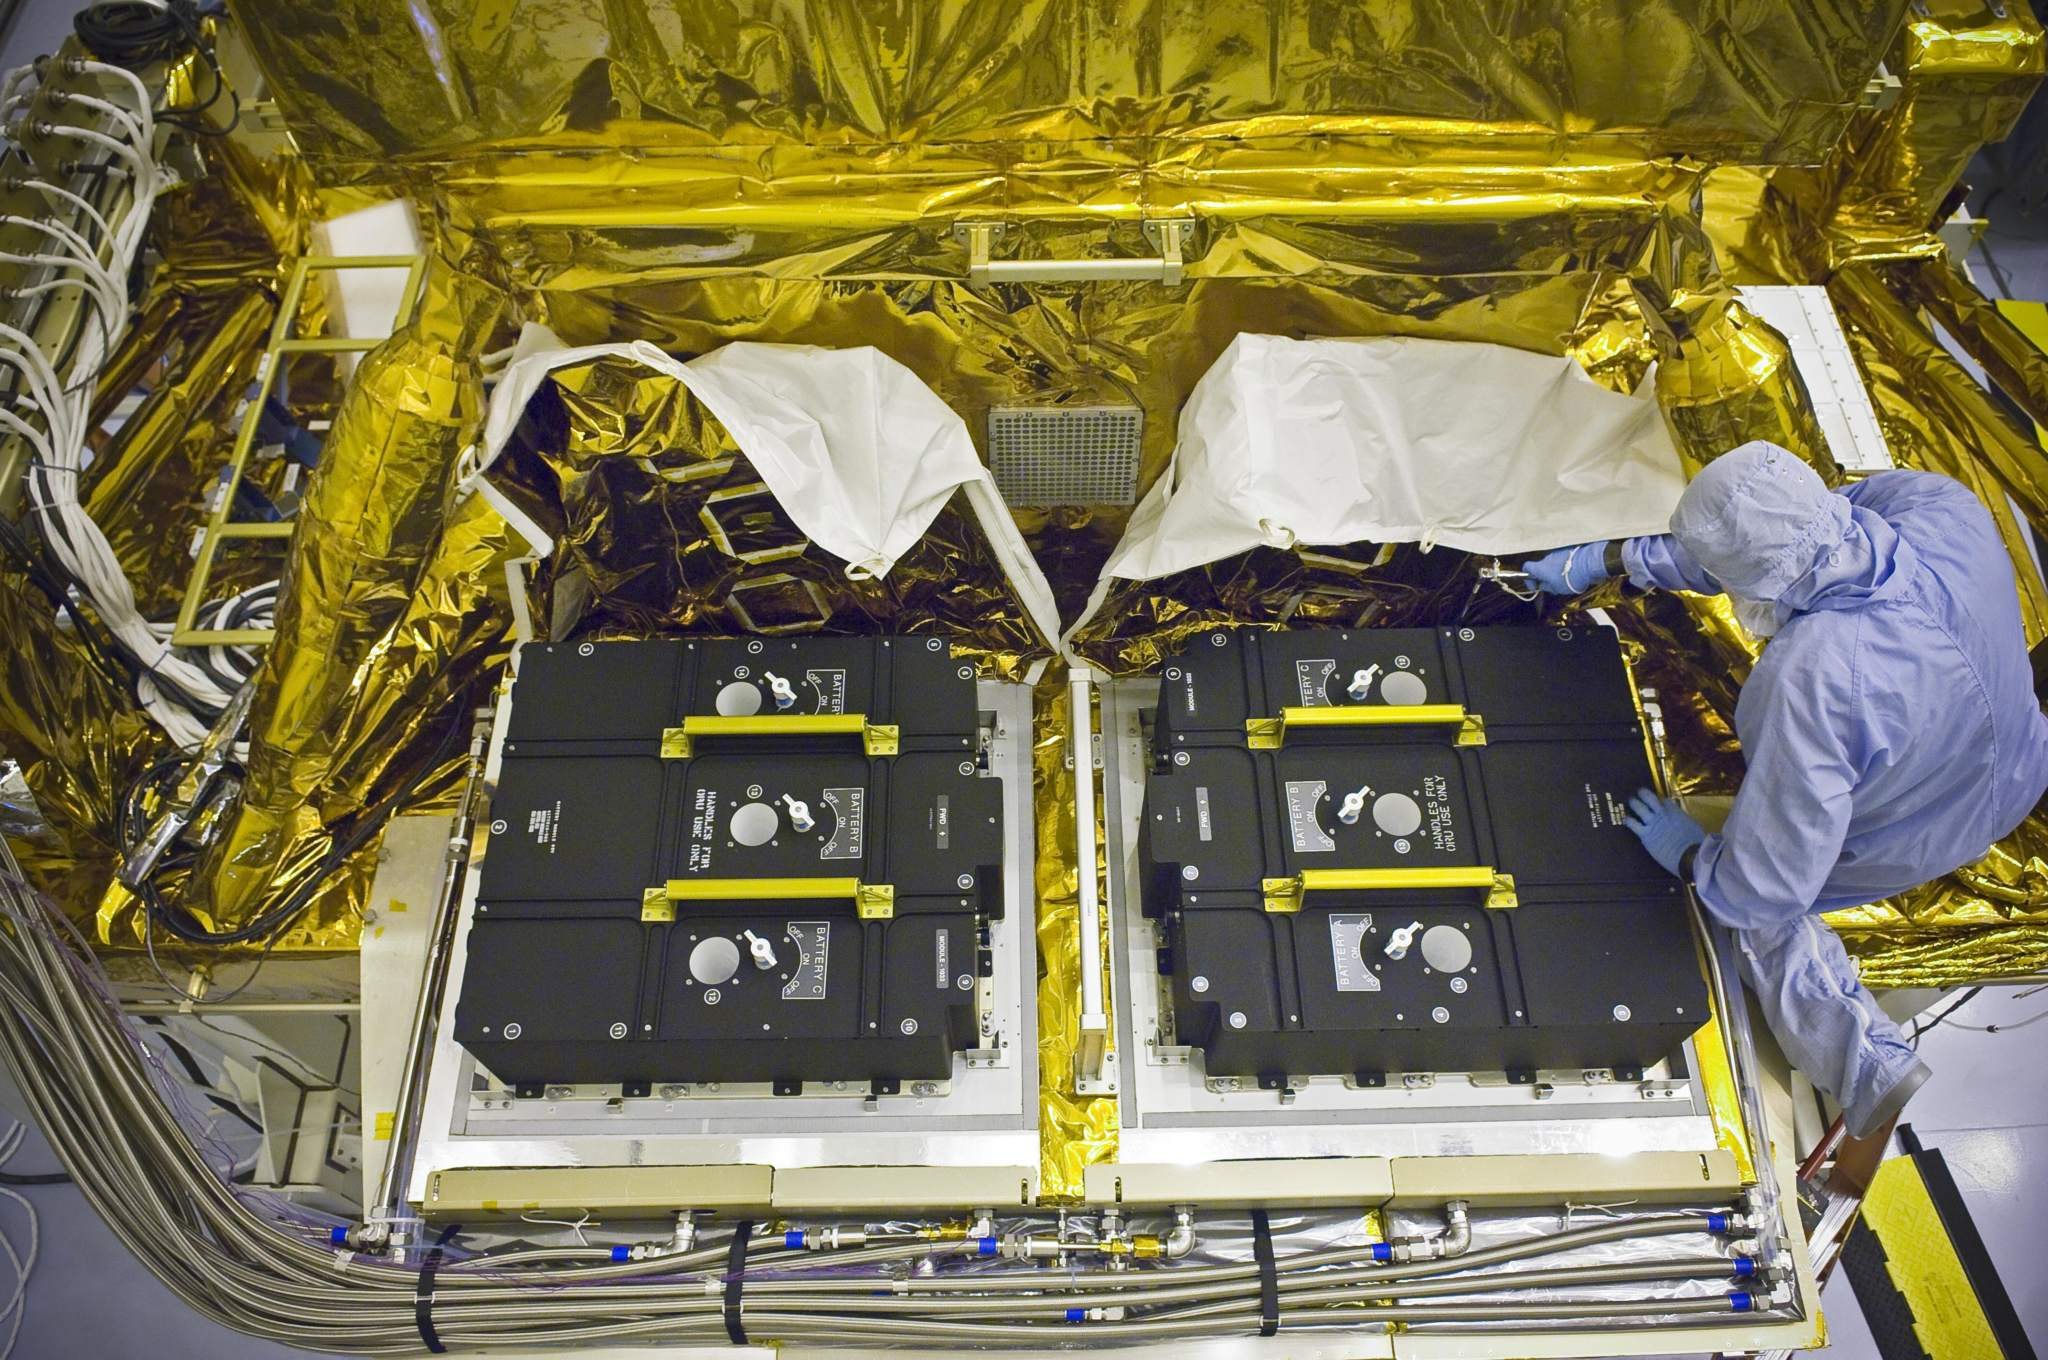 Technicians installing new batteries onto the Hubble Space Telescope. Photo via NASA.